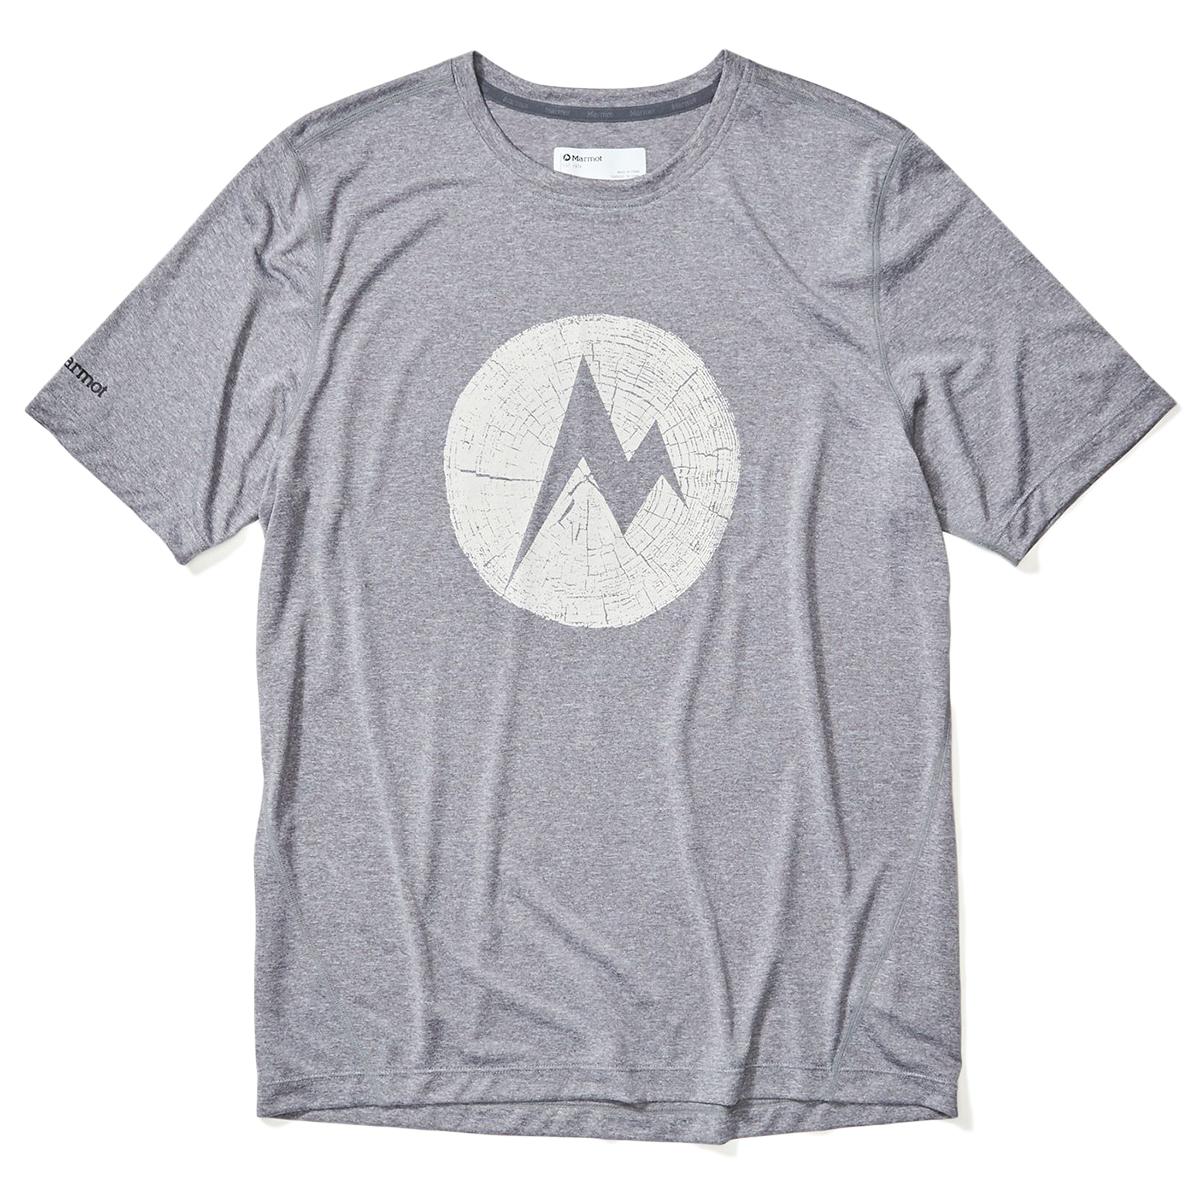 Marmot Men's Transporter Short-Sleeve Tee - Black, M